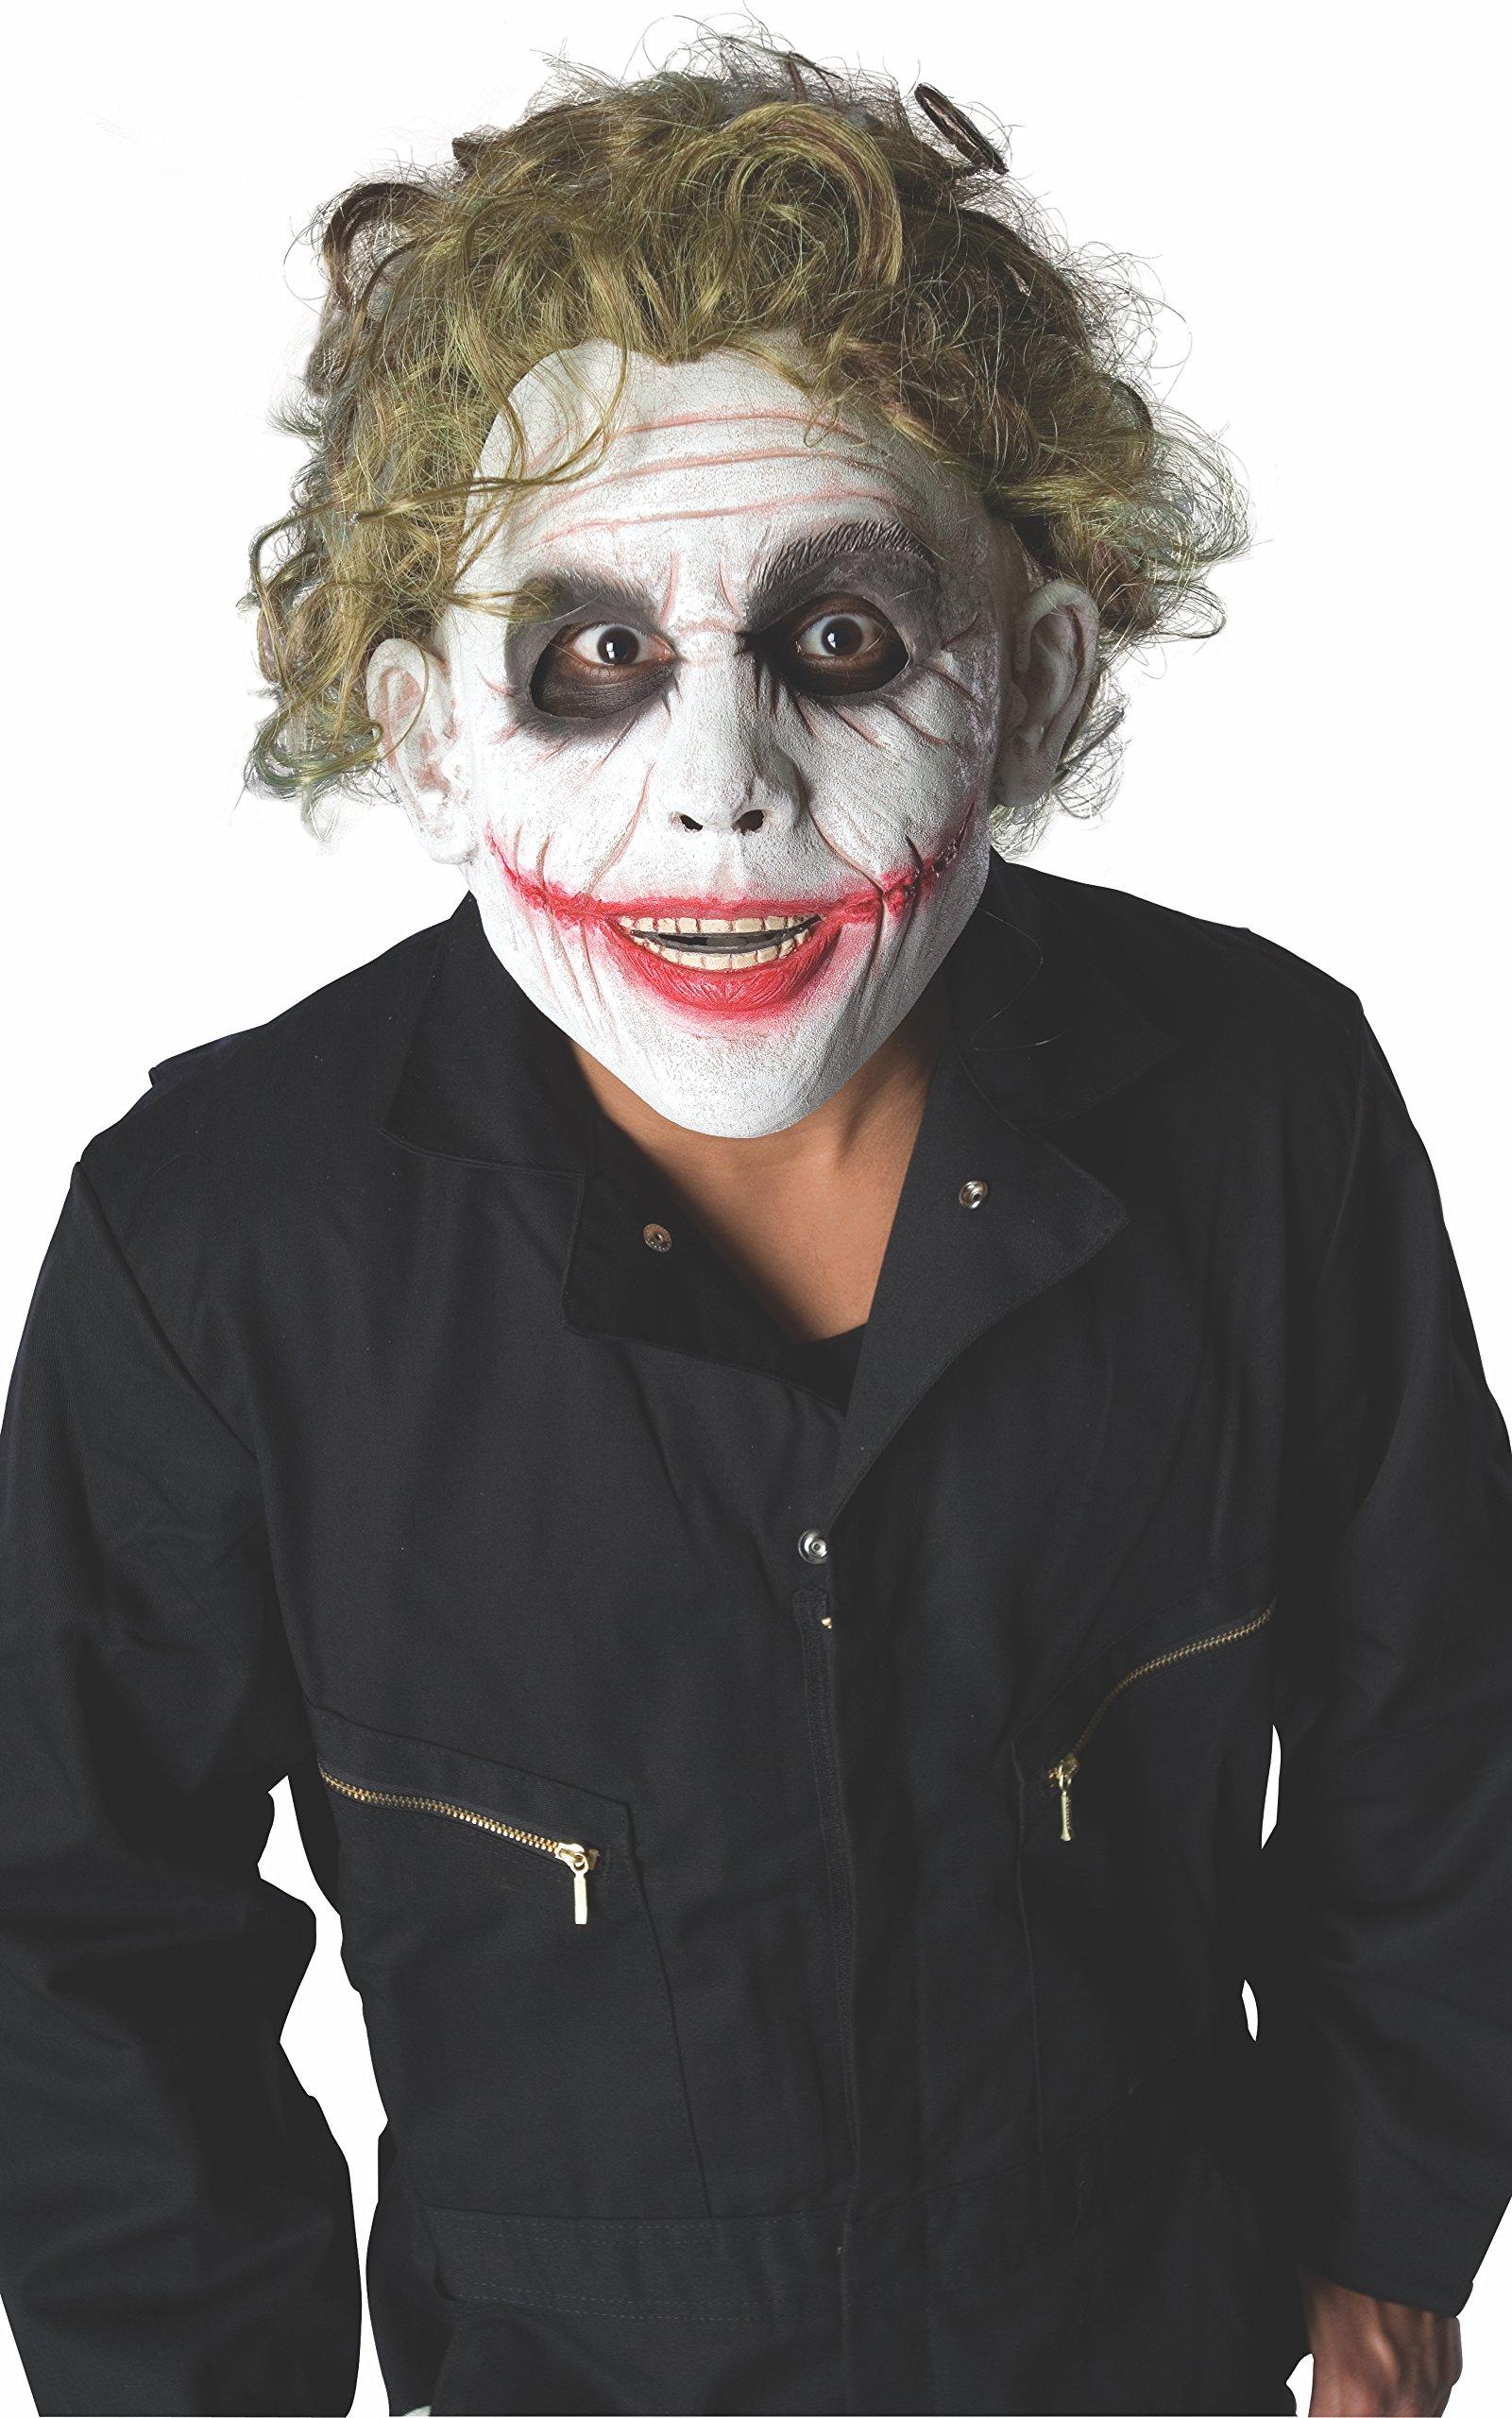 Batman The Dark Knight Child's Wig, The Joker by Rubie's